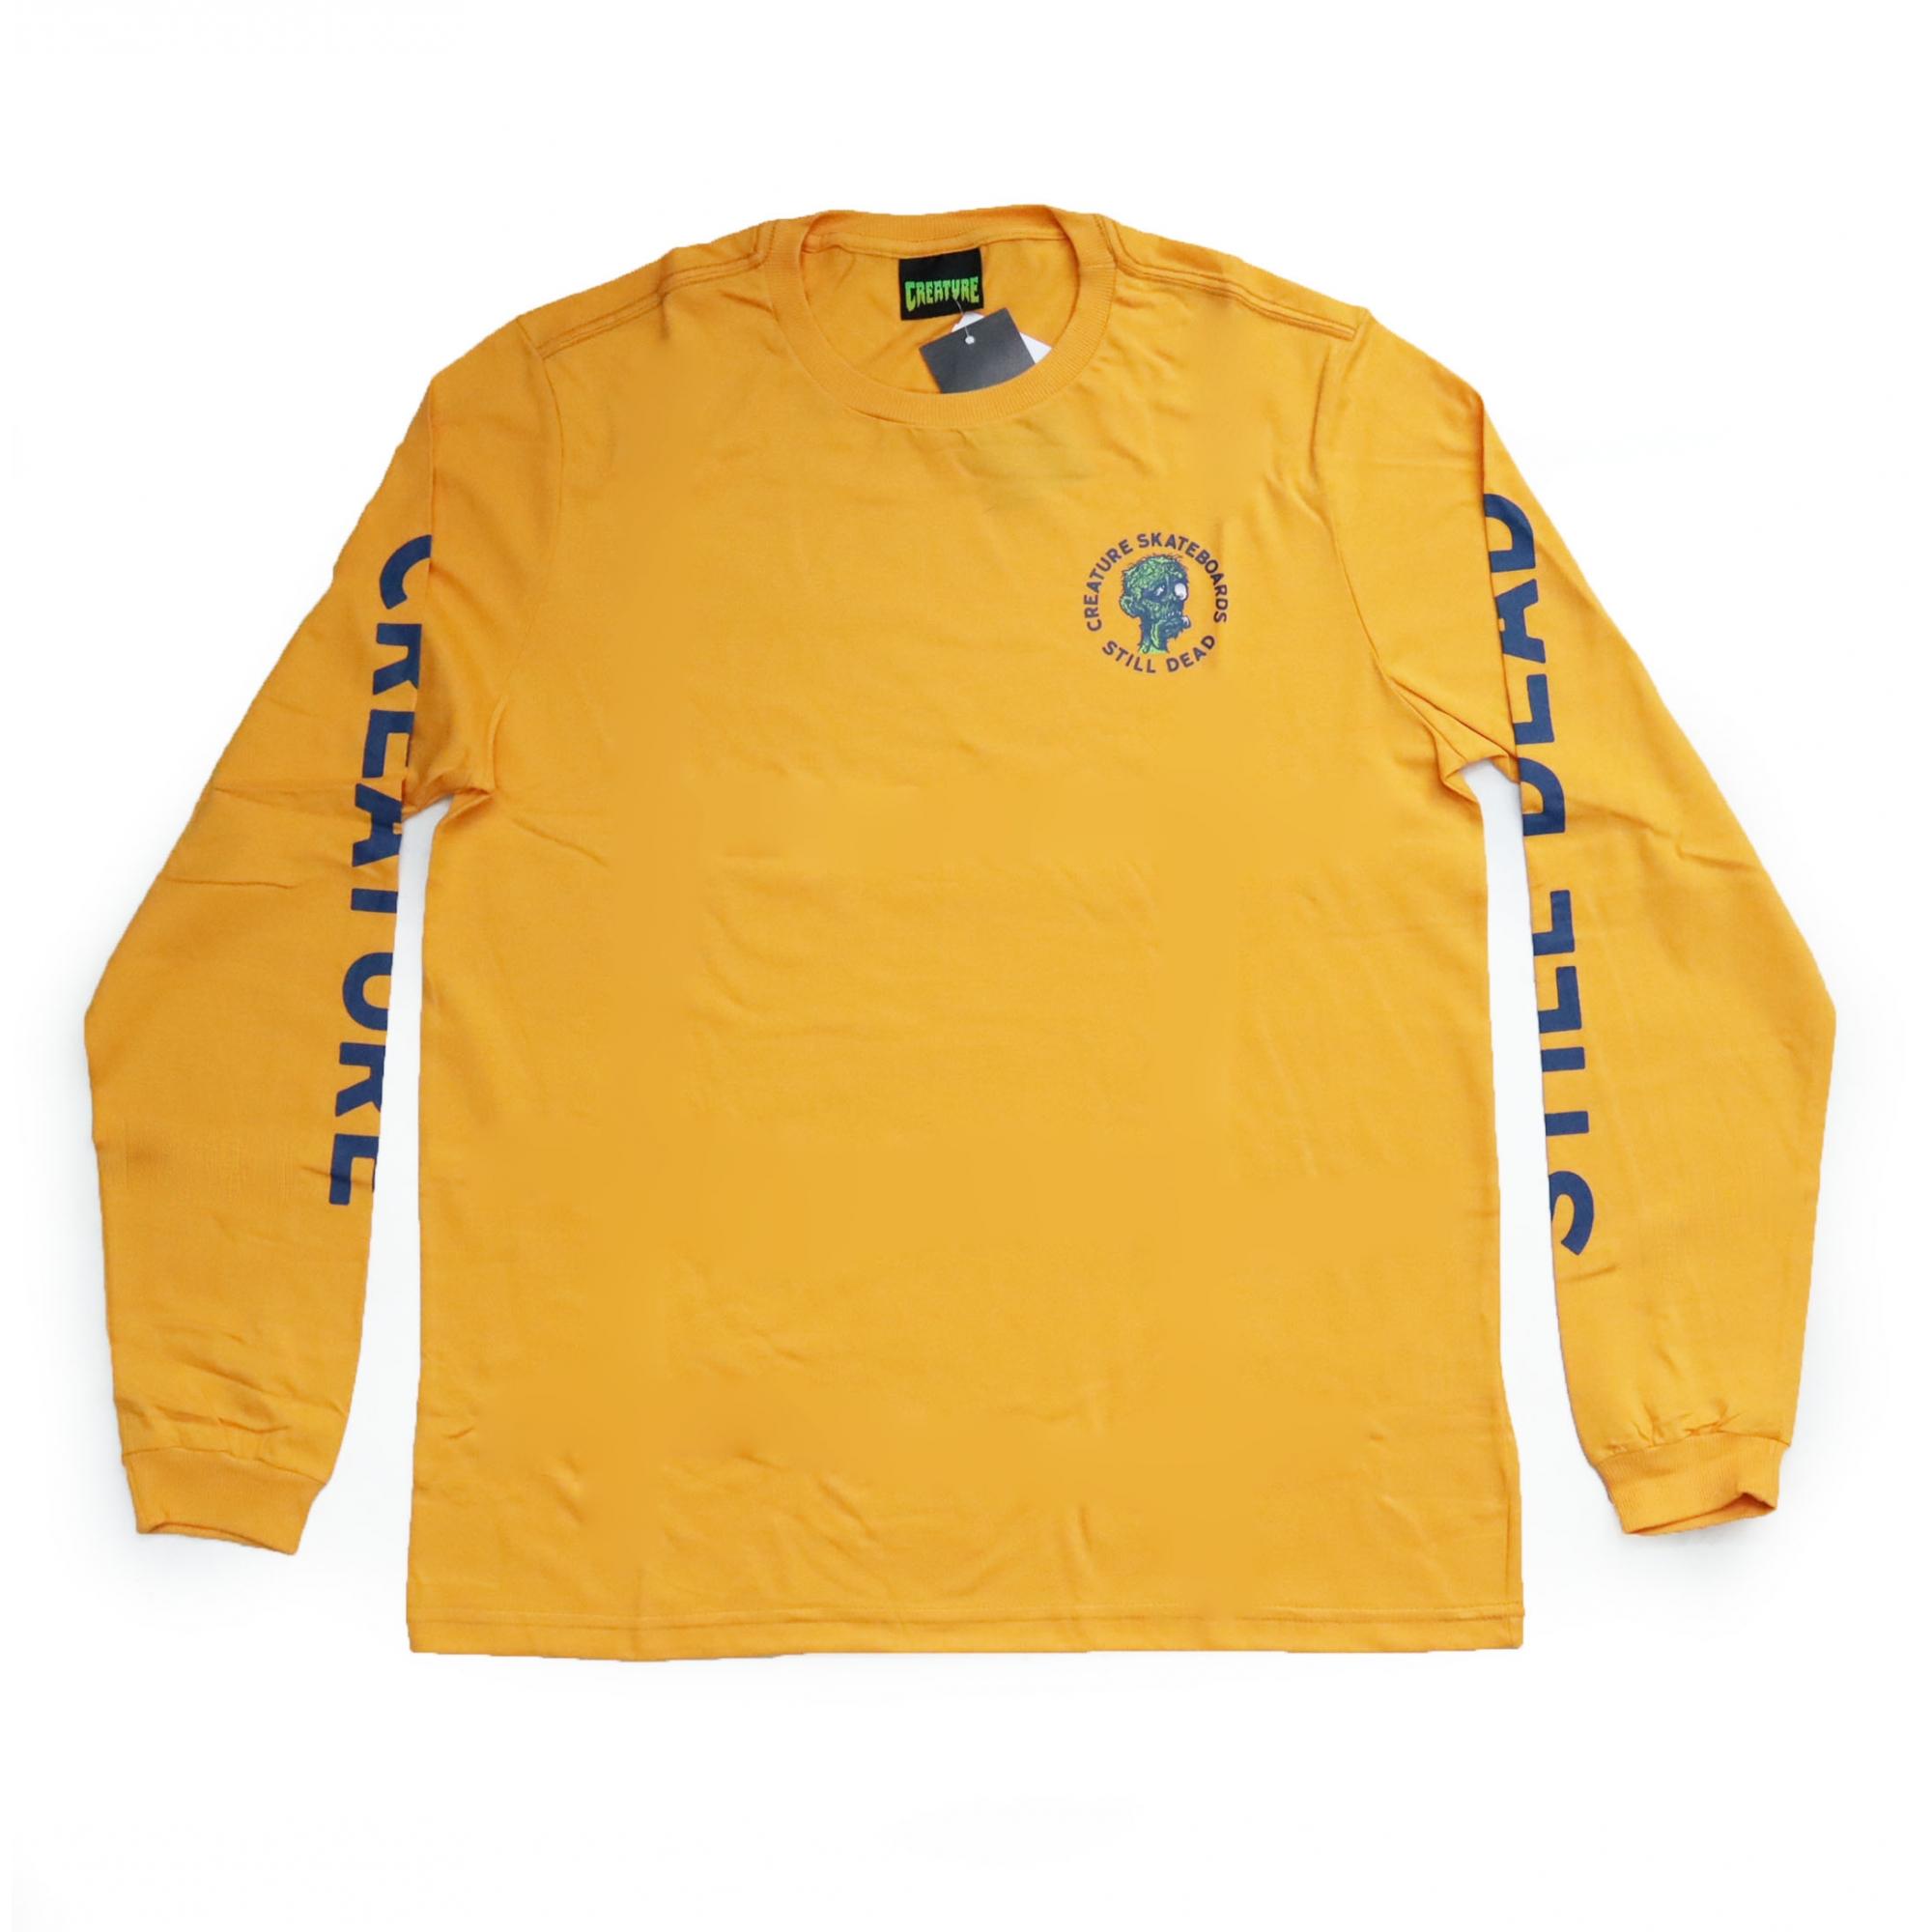 Camiseta Manga Longa Creature Retorn Of The Fiend - Amarelo Mostarda